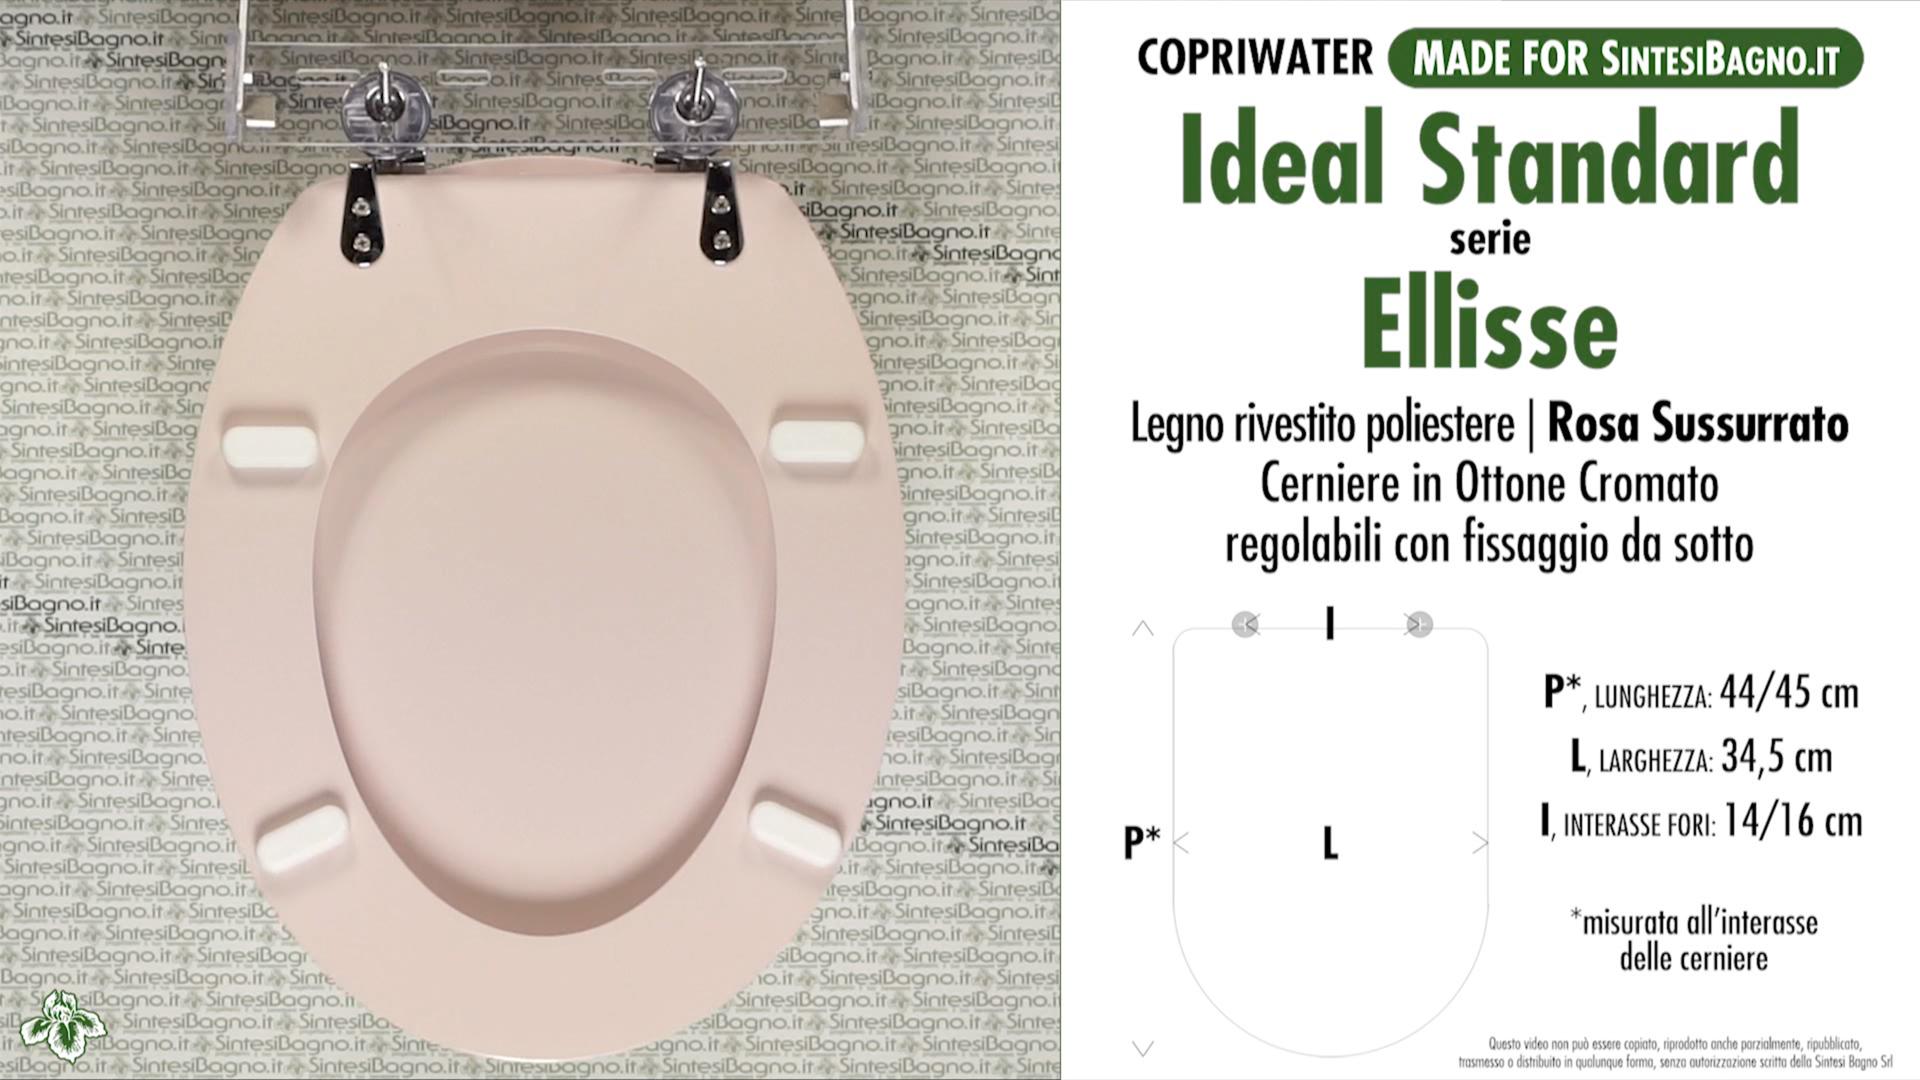 SCHEDA TECNICA MISURE copriwater IDEAL STANDARD ELLISSE